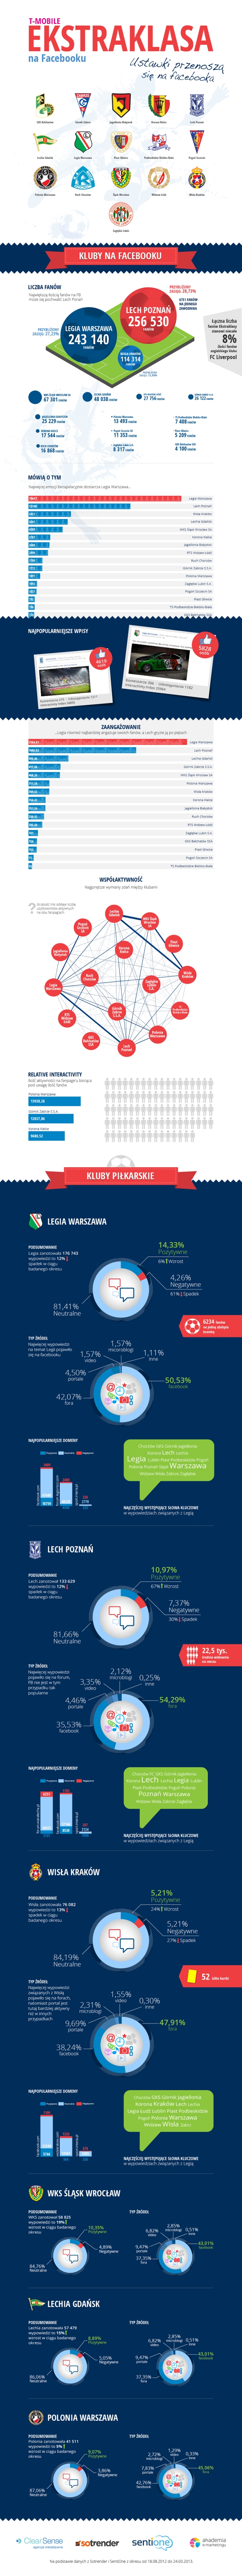 T-Mobile Ekstraklasa na Facebooku